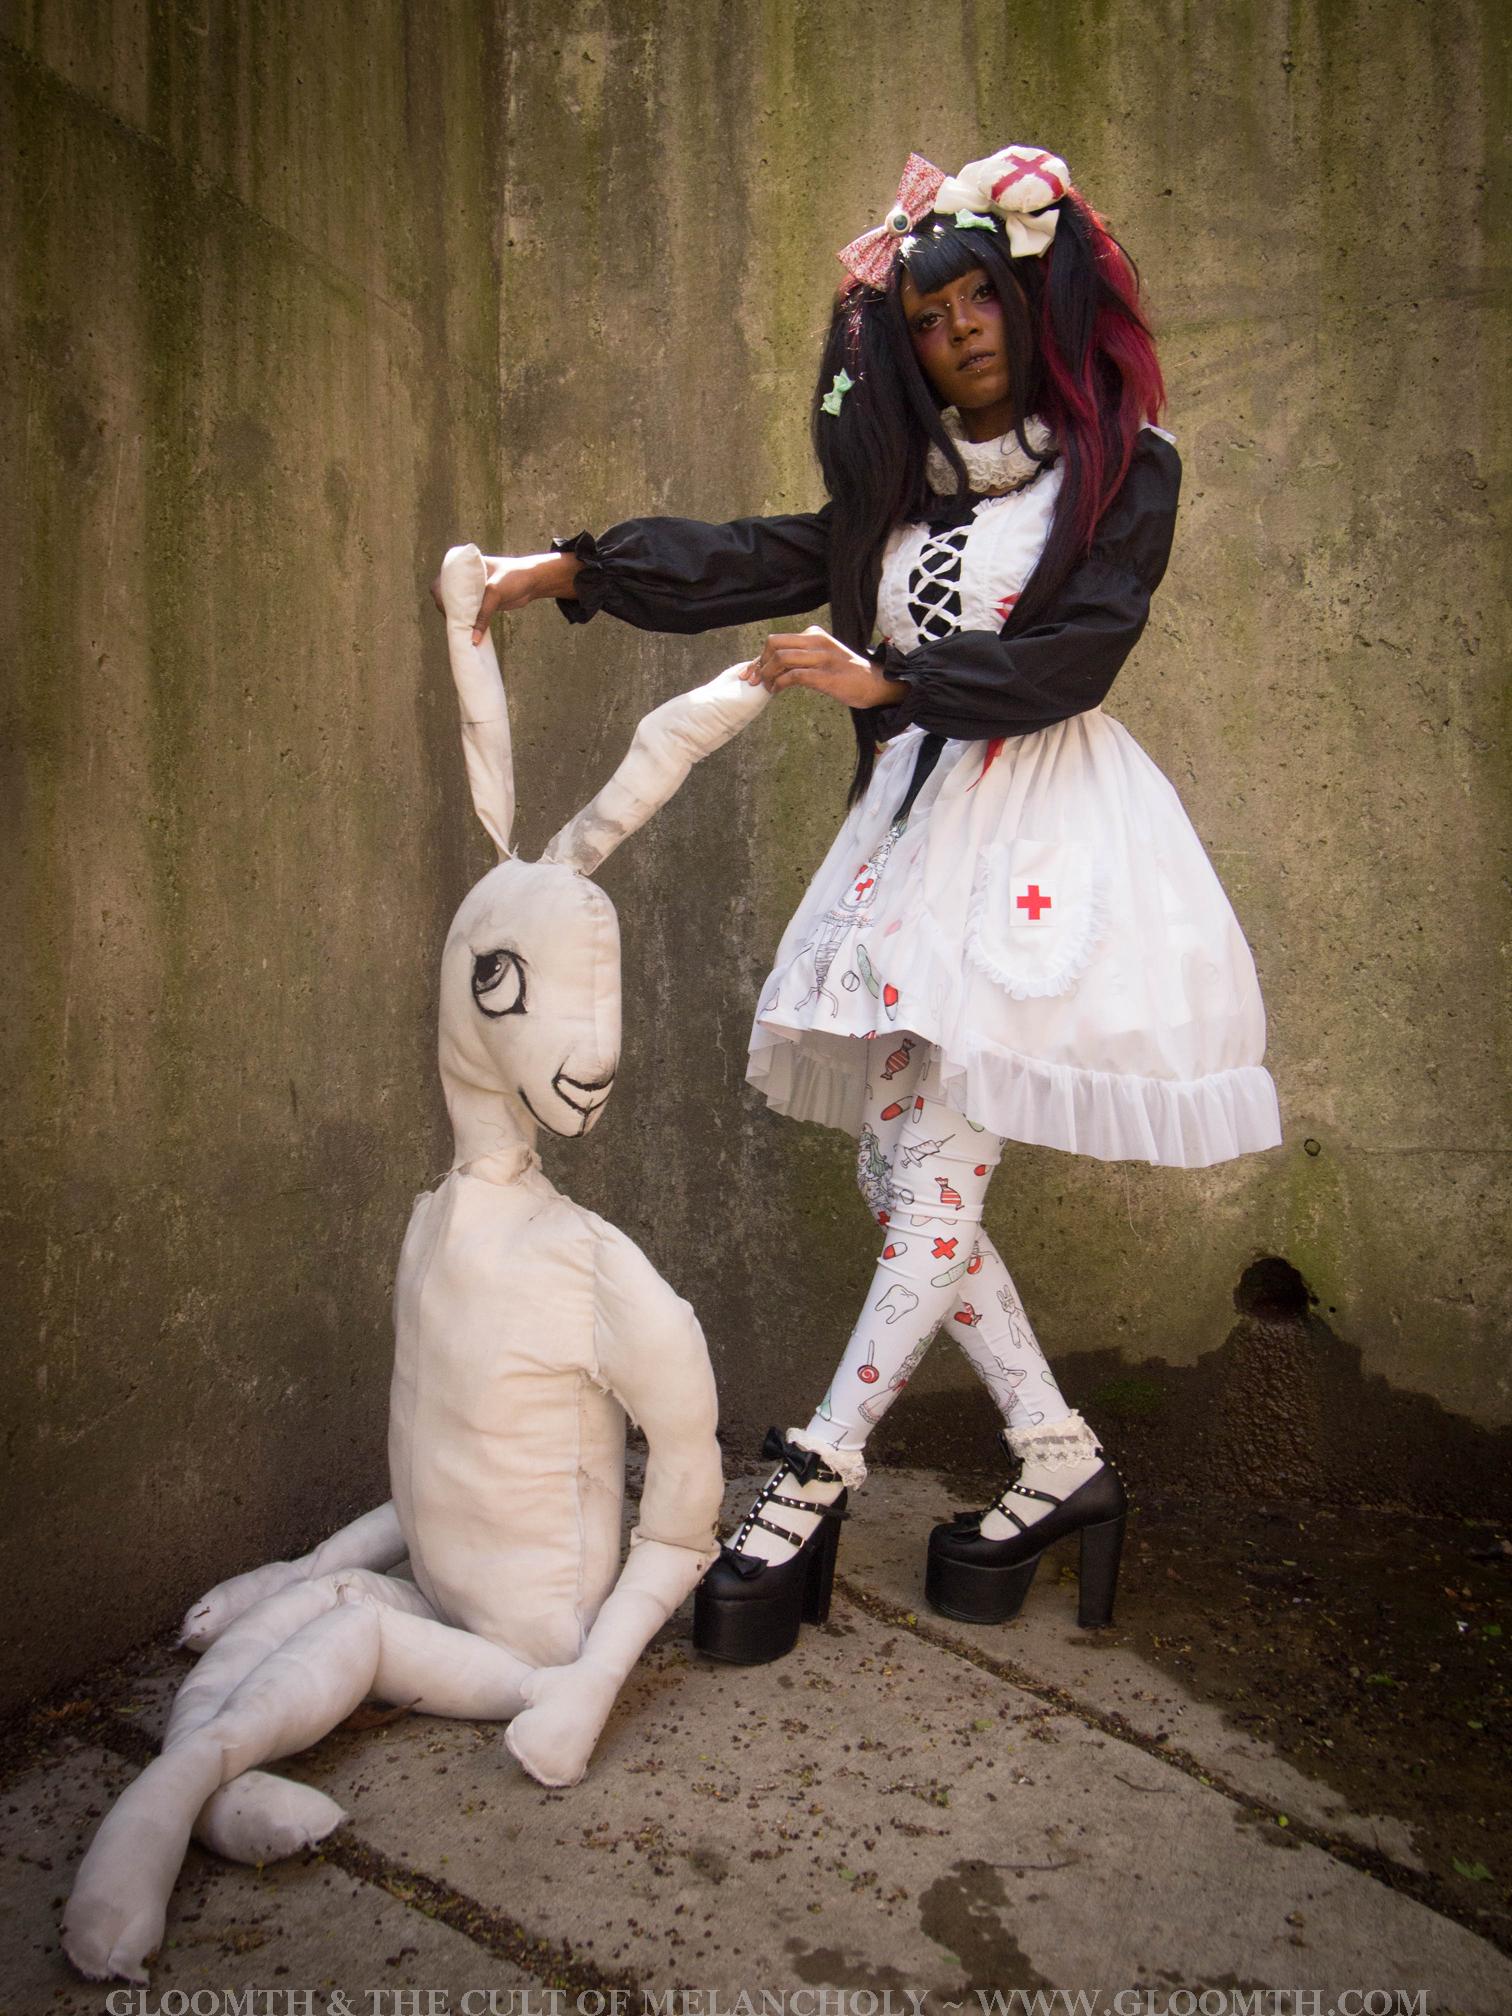 Model: Dolly Momoiro Photographer: Taeden Hall